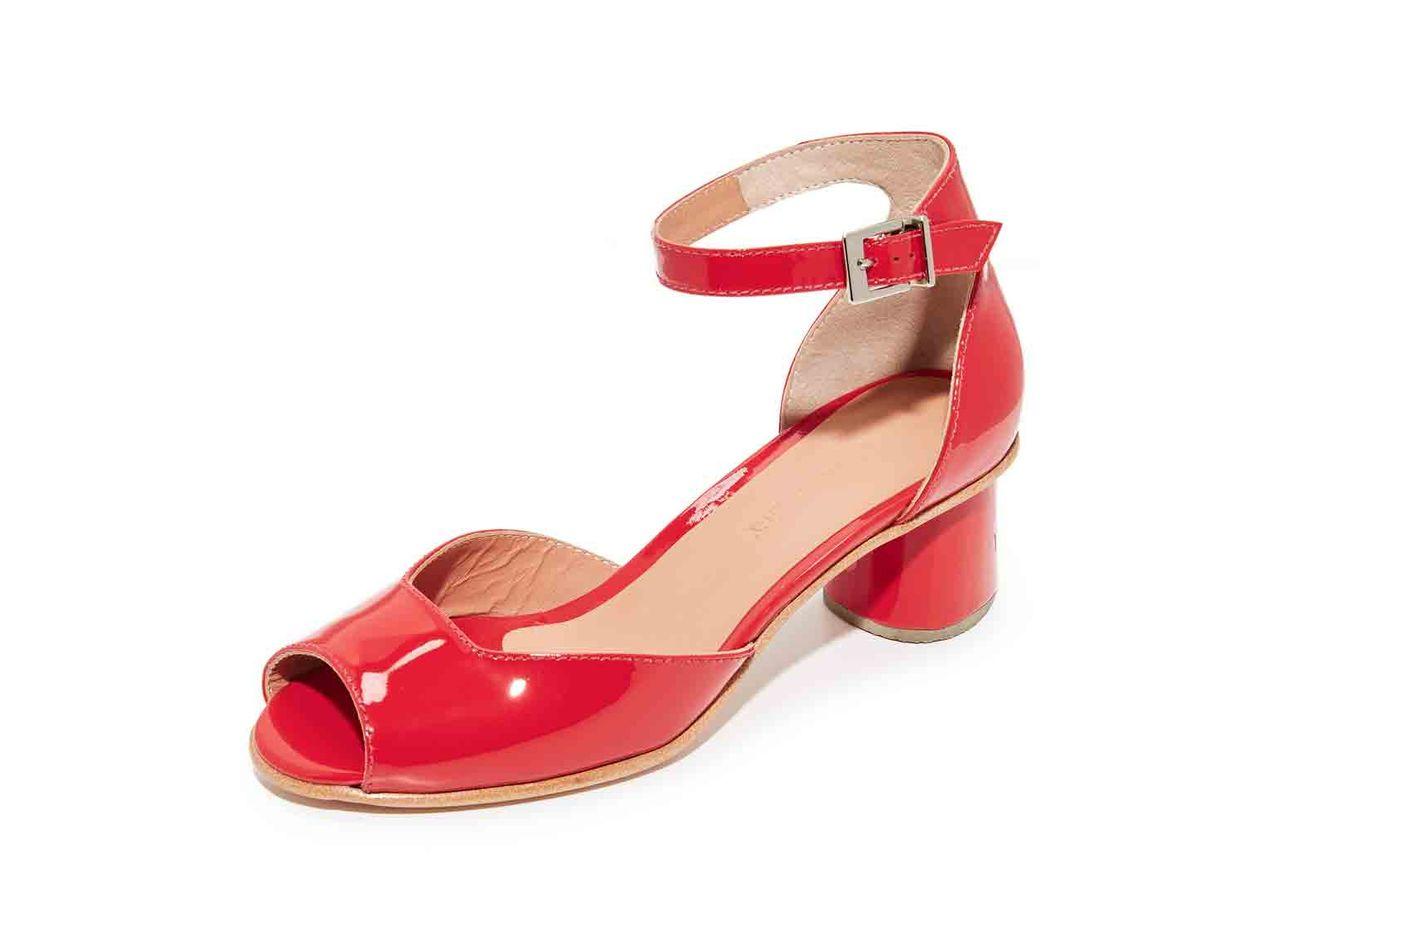 Rachel Comey Bodie City Sandals